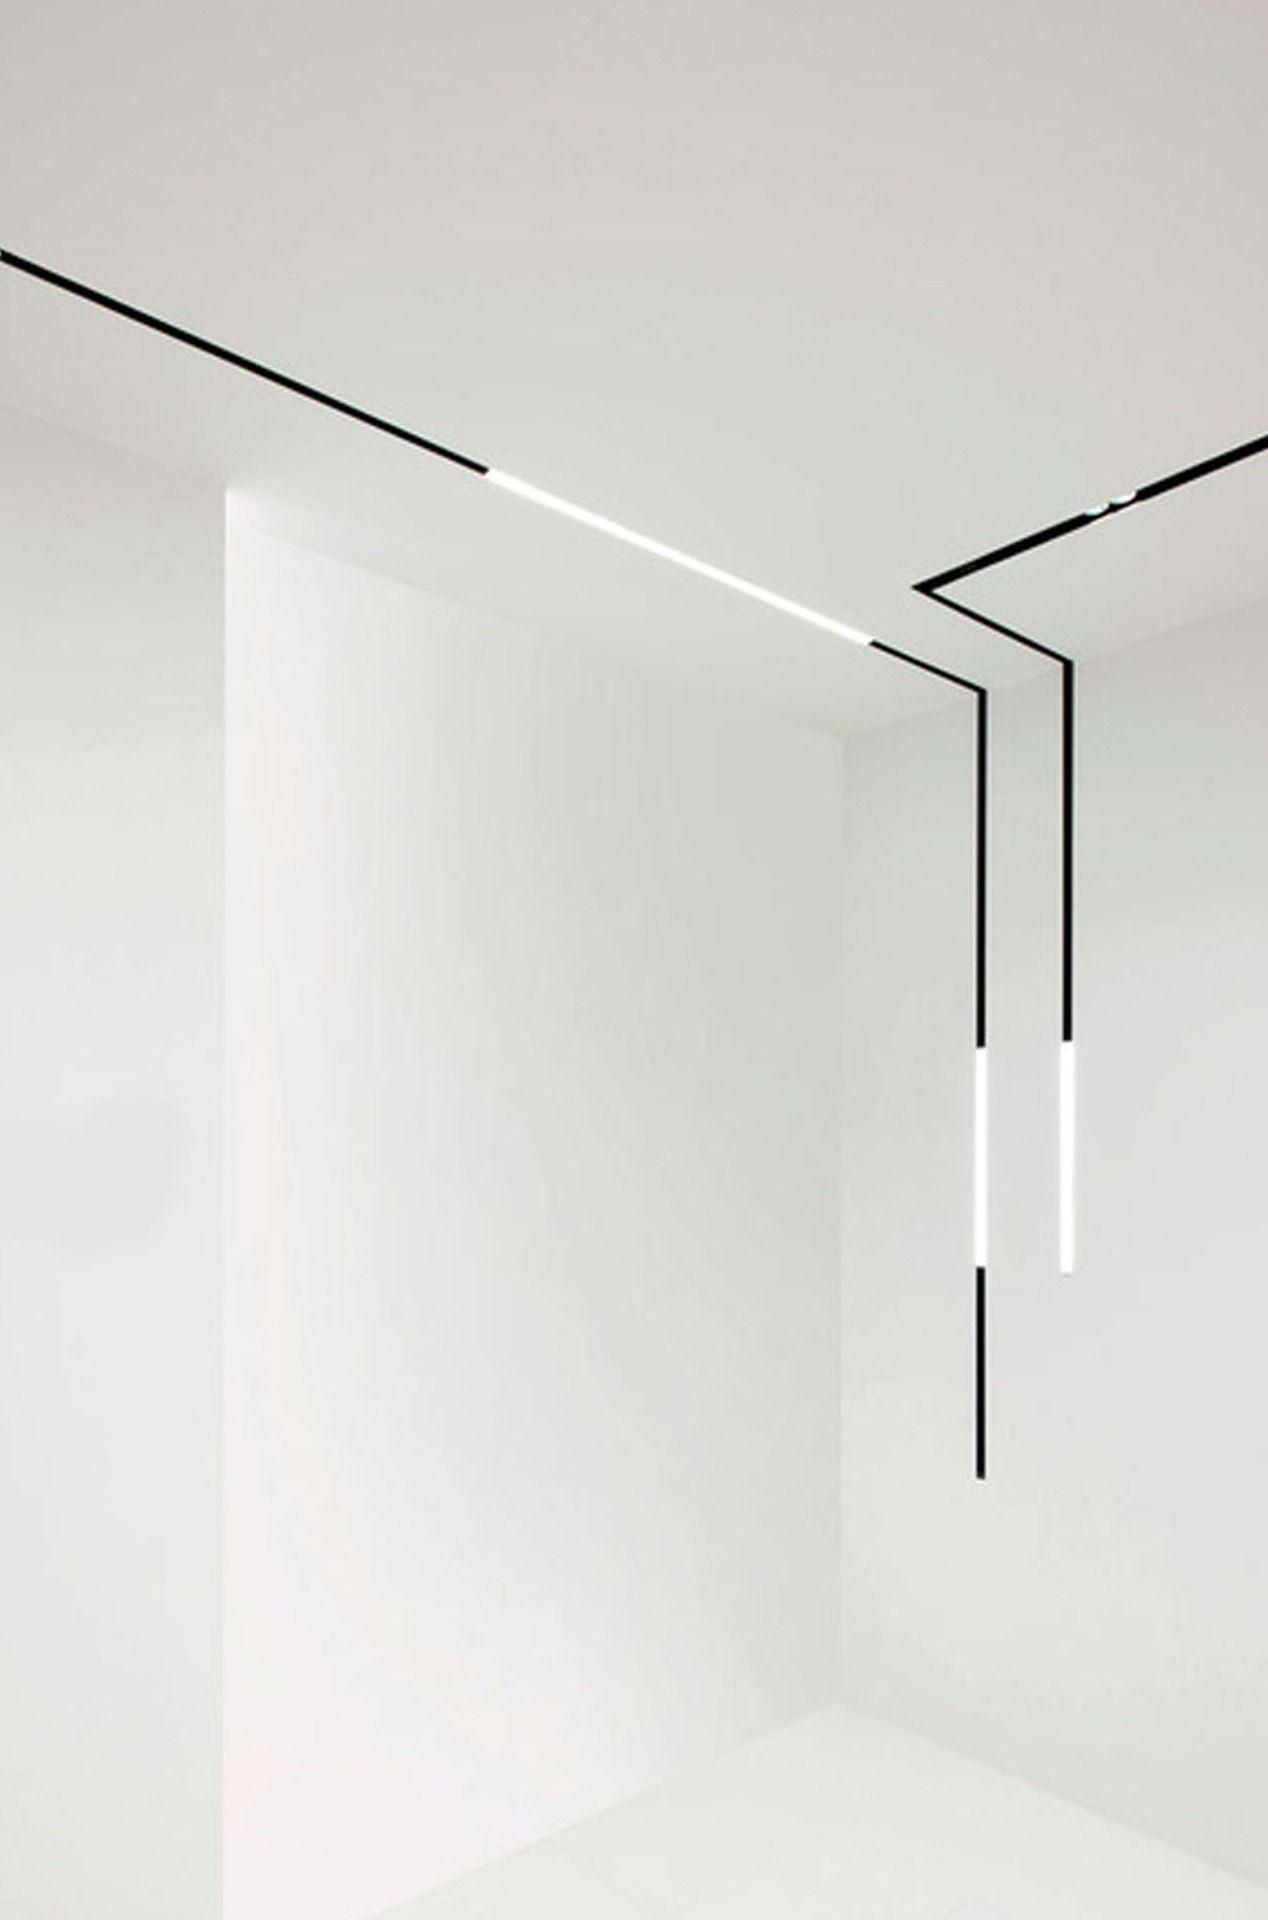 Splitline 29 architectural track light system by delta light splitline 29 architectural track light system by delta light aloadofball Images